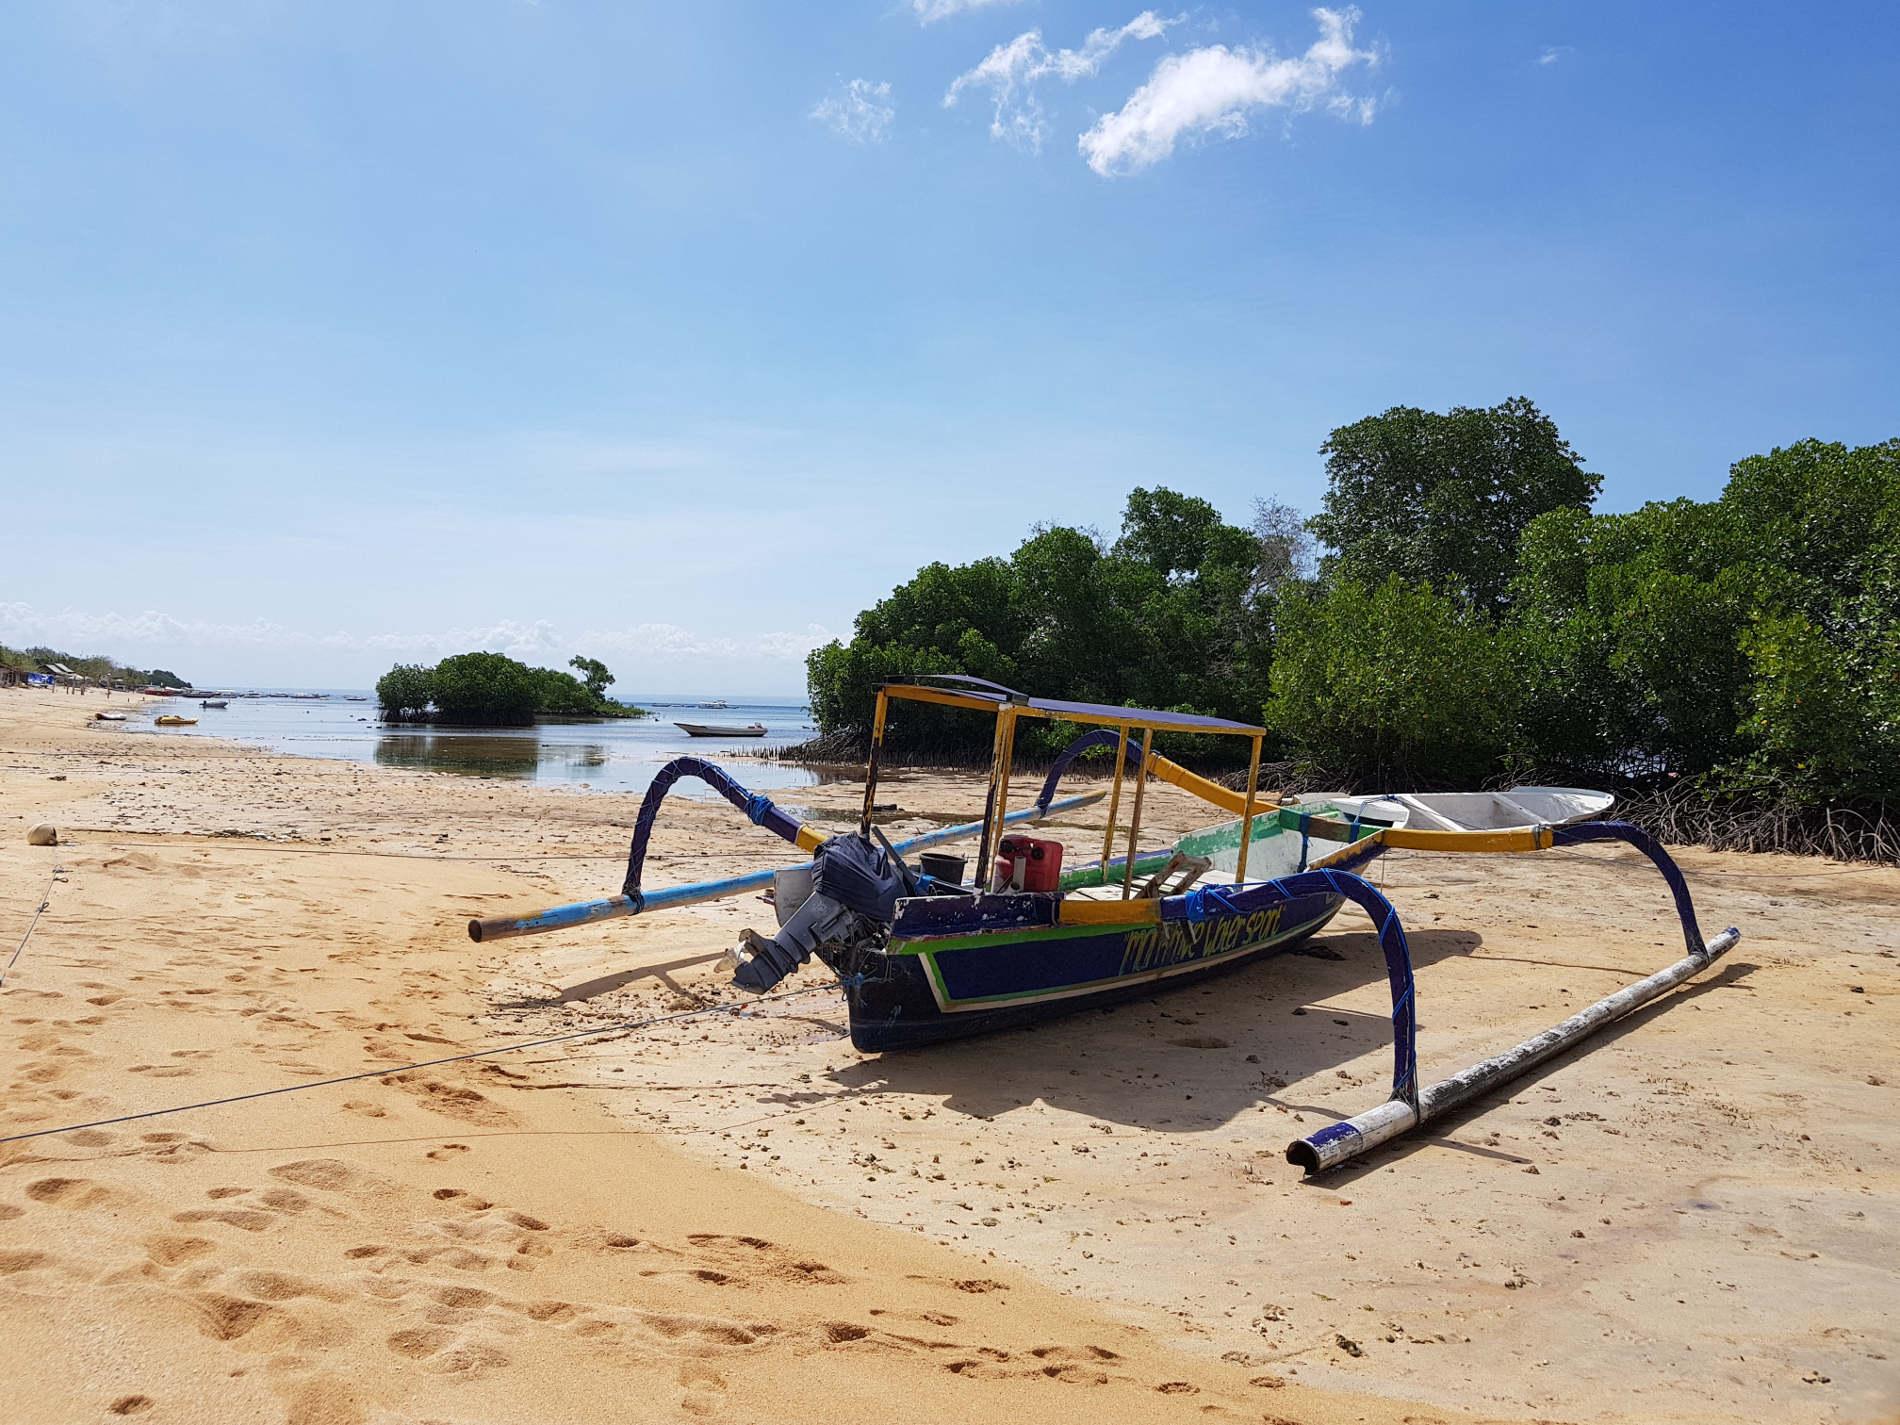 Itinerario a Bali - La bella spiaggia di Mangrove Point a Nusa Lembongan